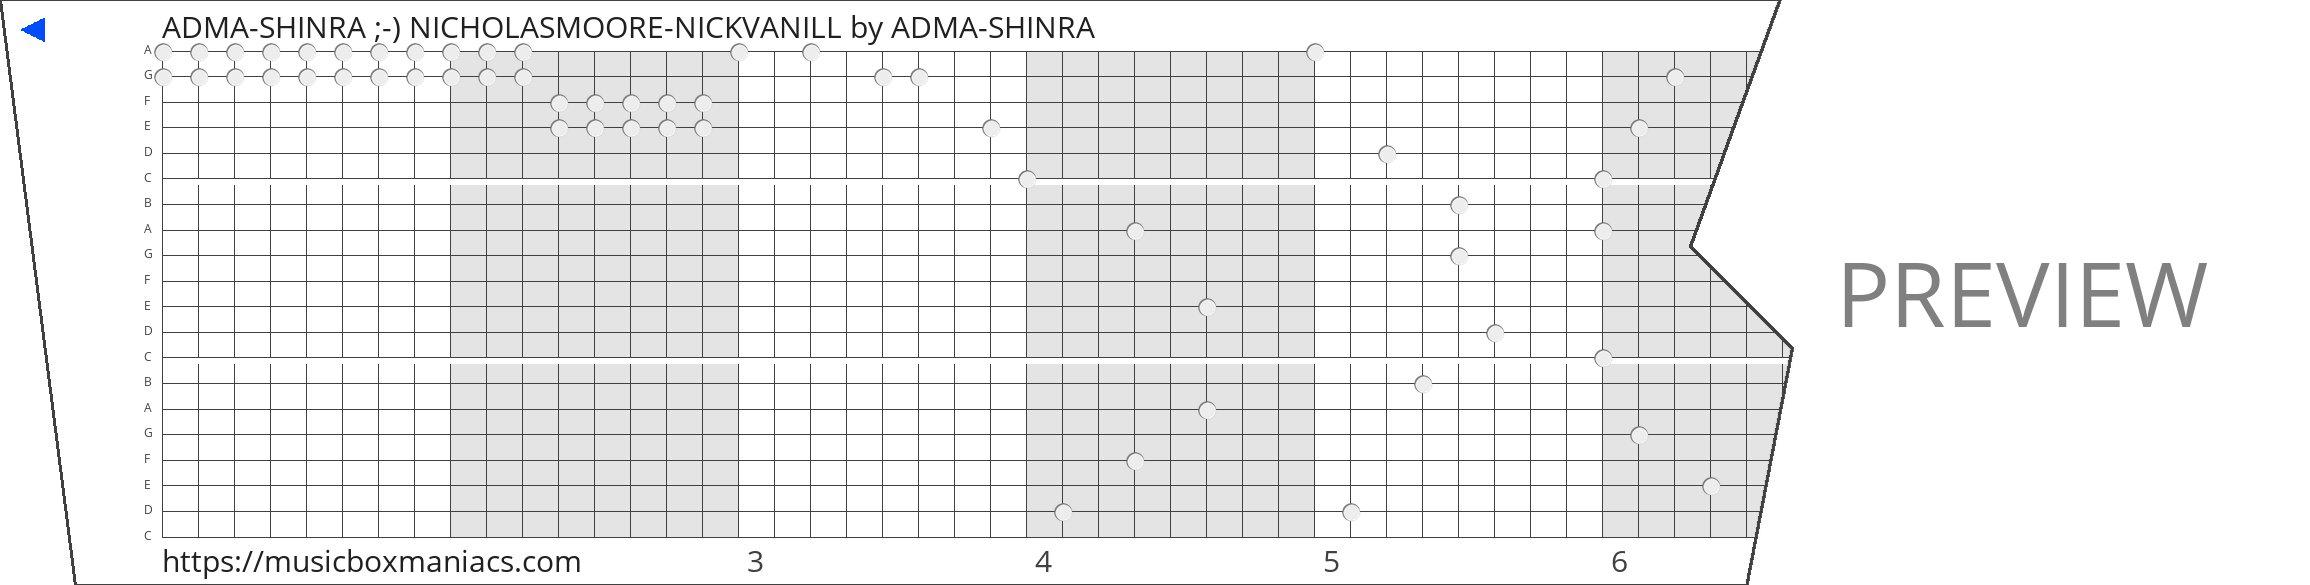 ADMA-SHINRA ;-) NICHOLASMOORE-NICKVANILL 20 note music box paper strip